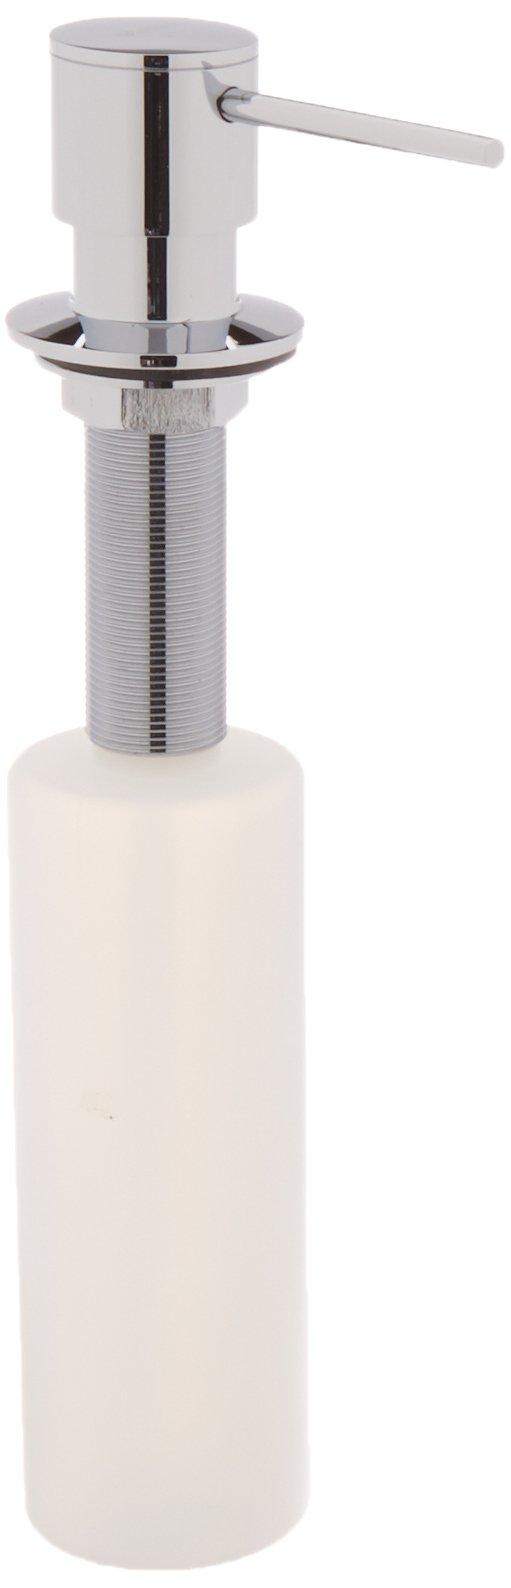 Blanco 441757 Sonoma Soap Dispenser, Polished Chrome